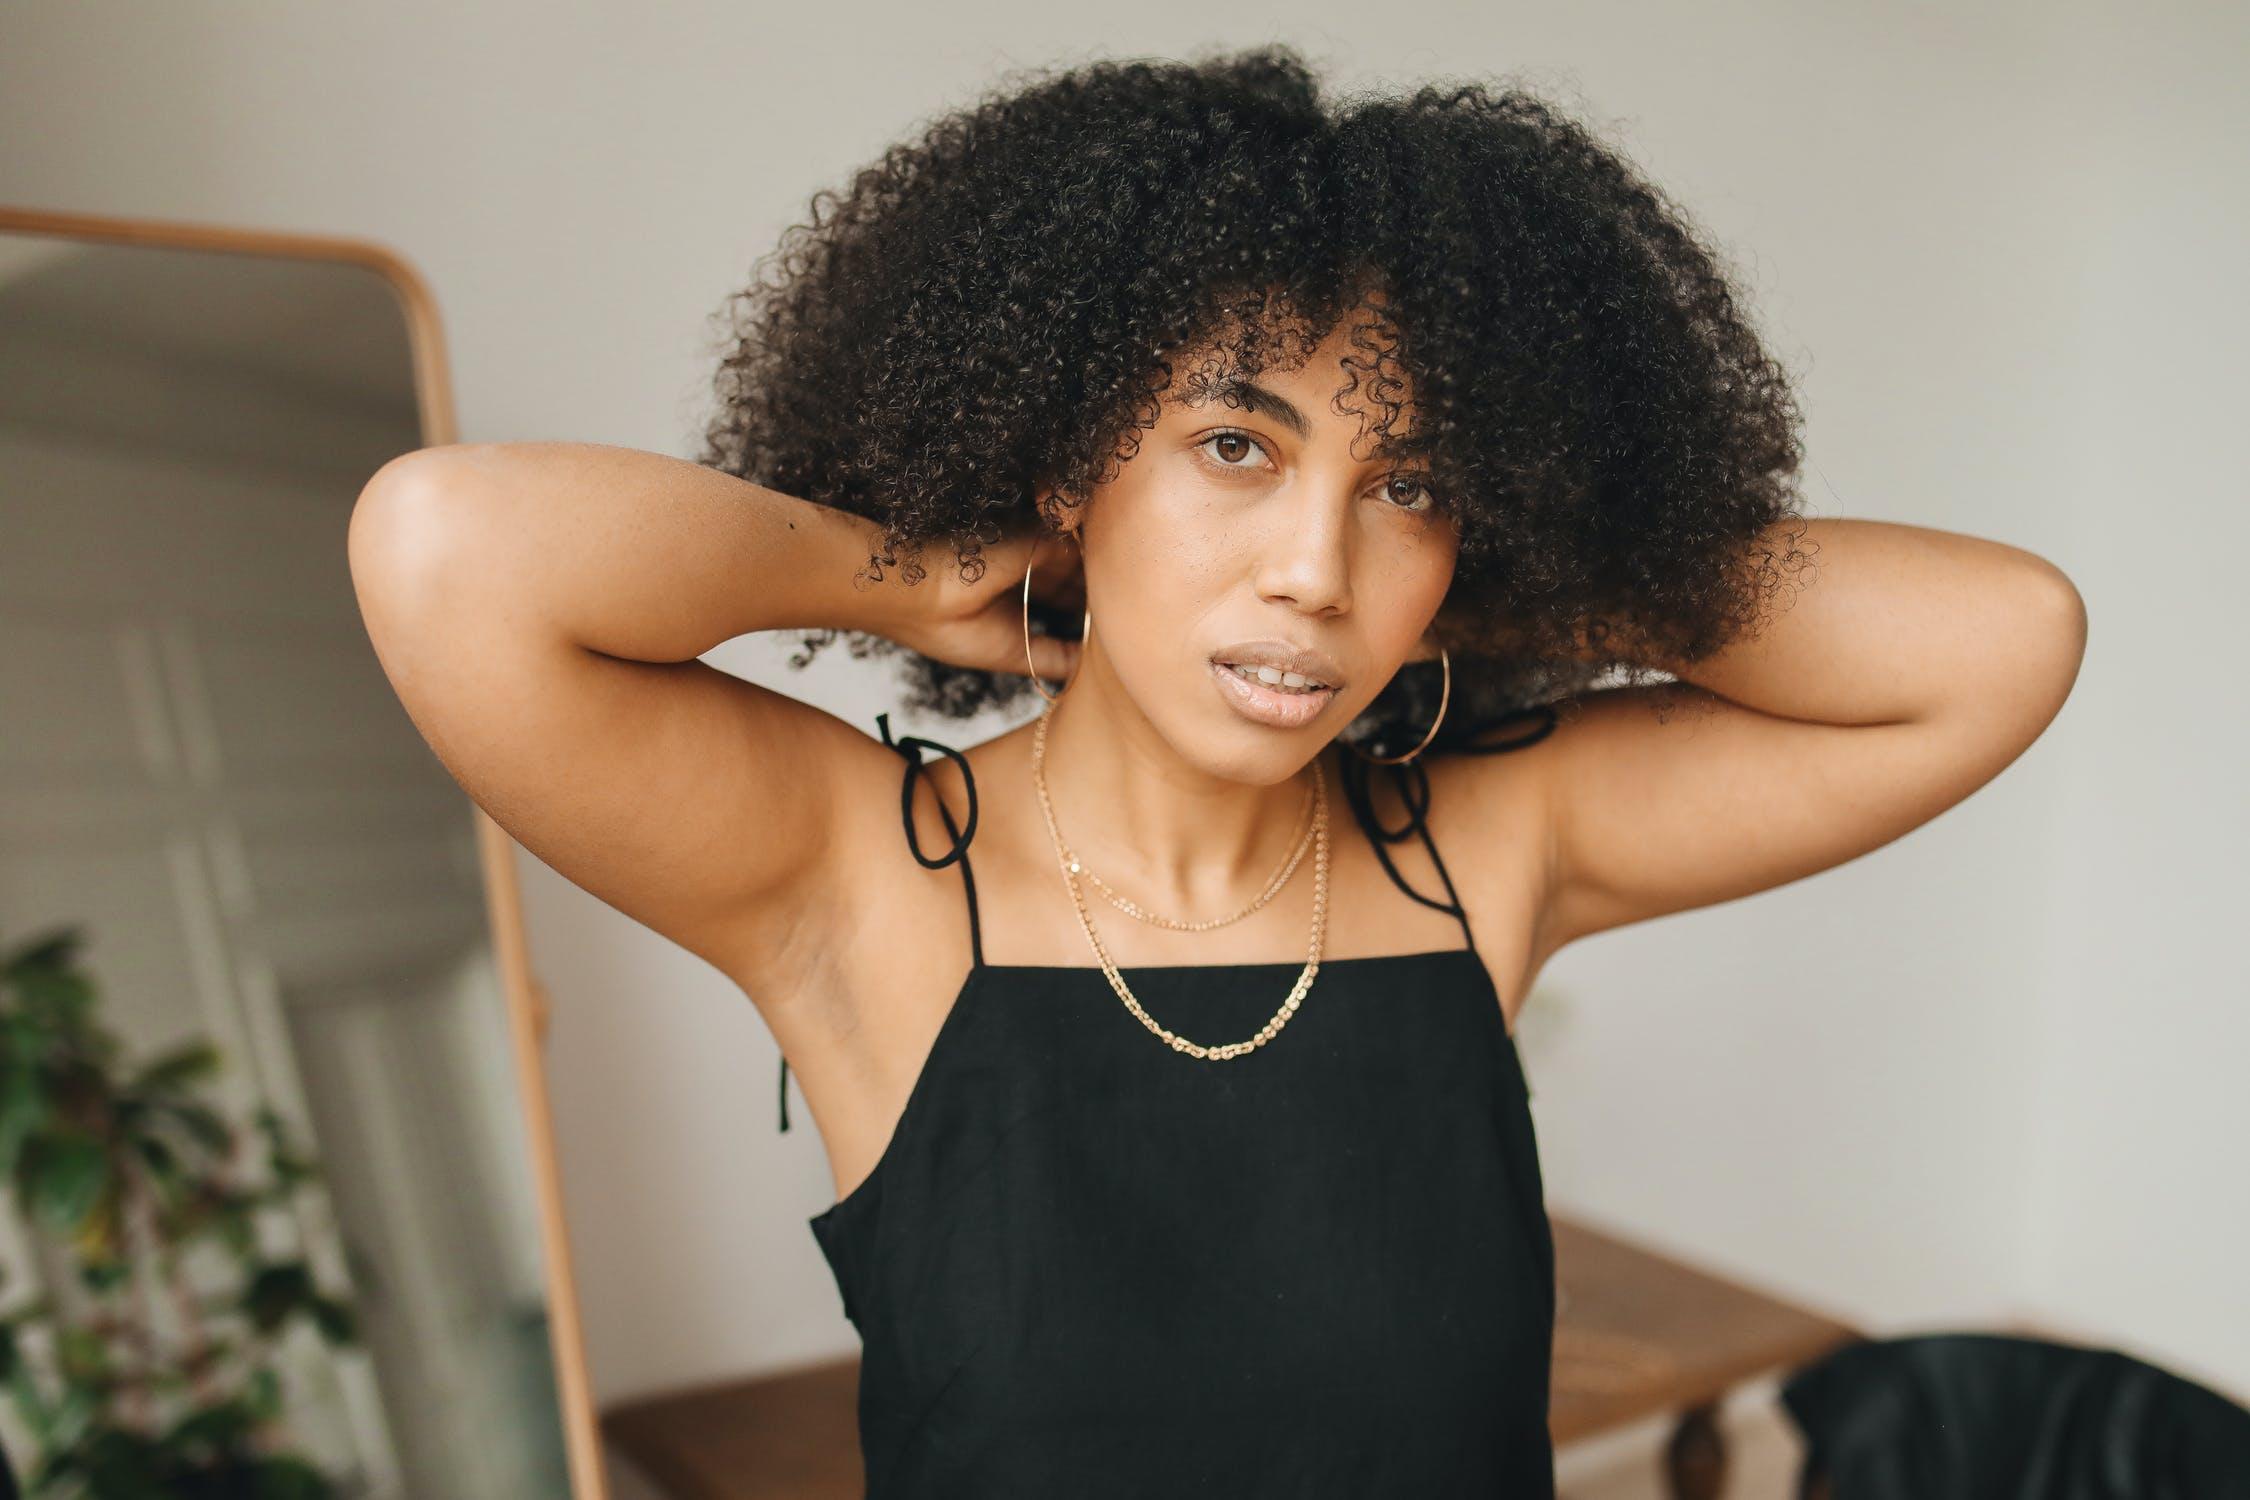 Black woman in black dress